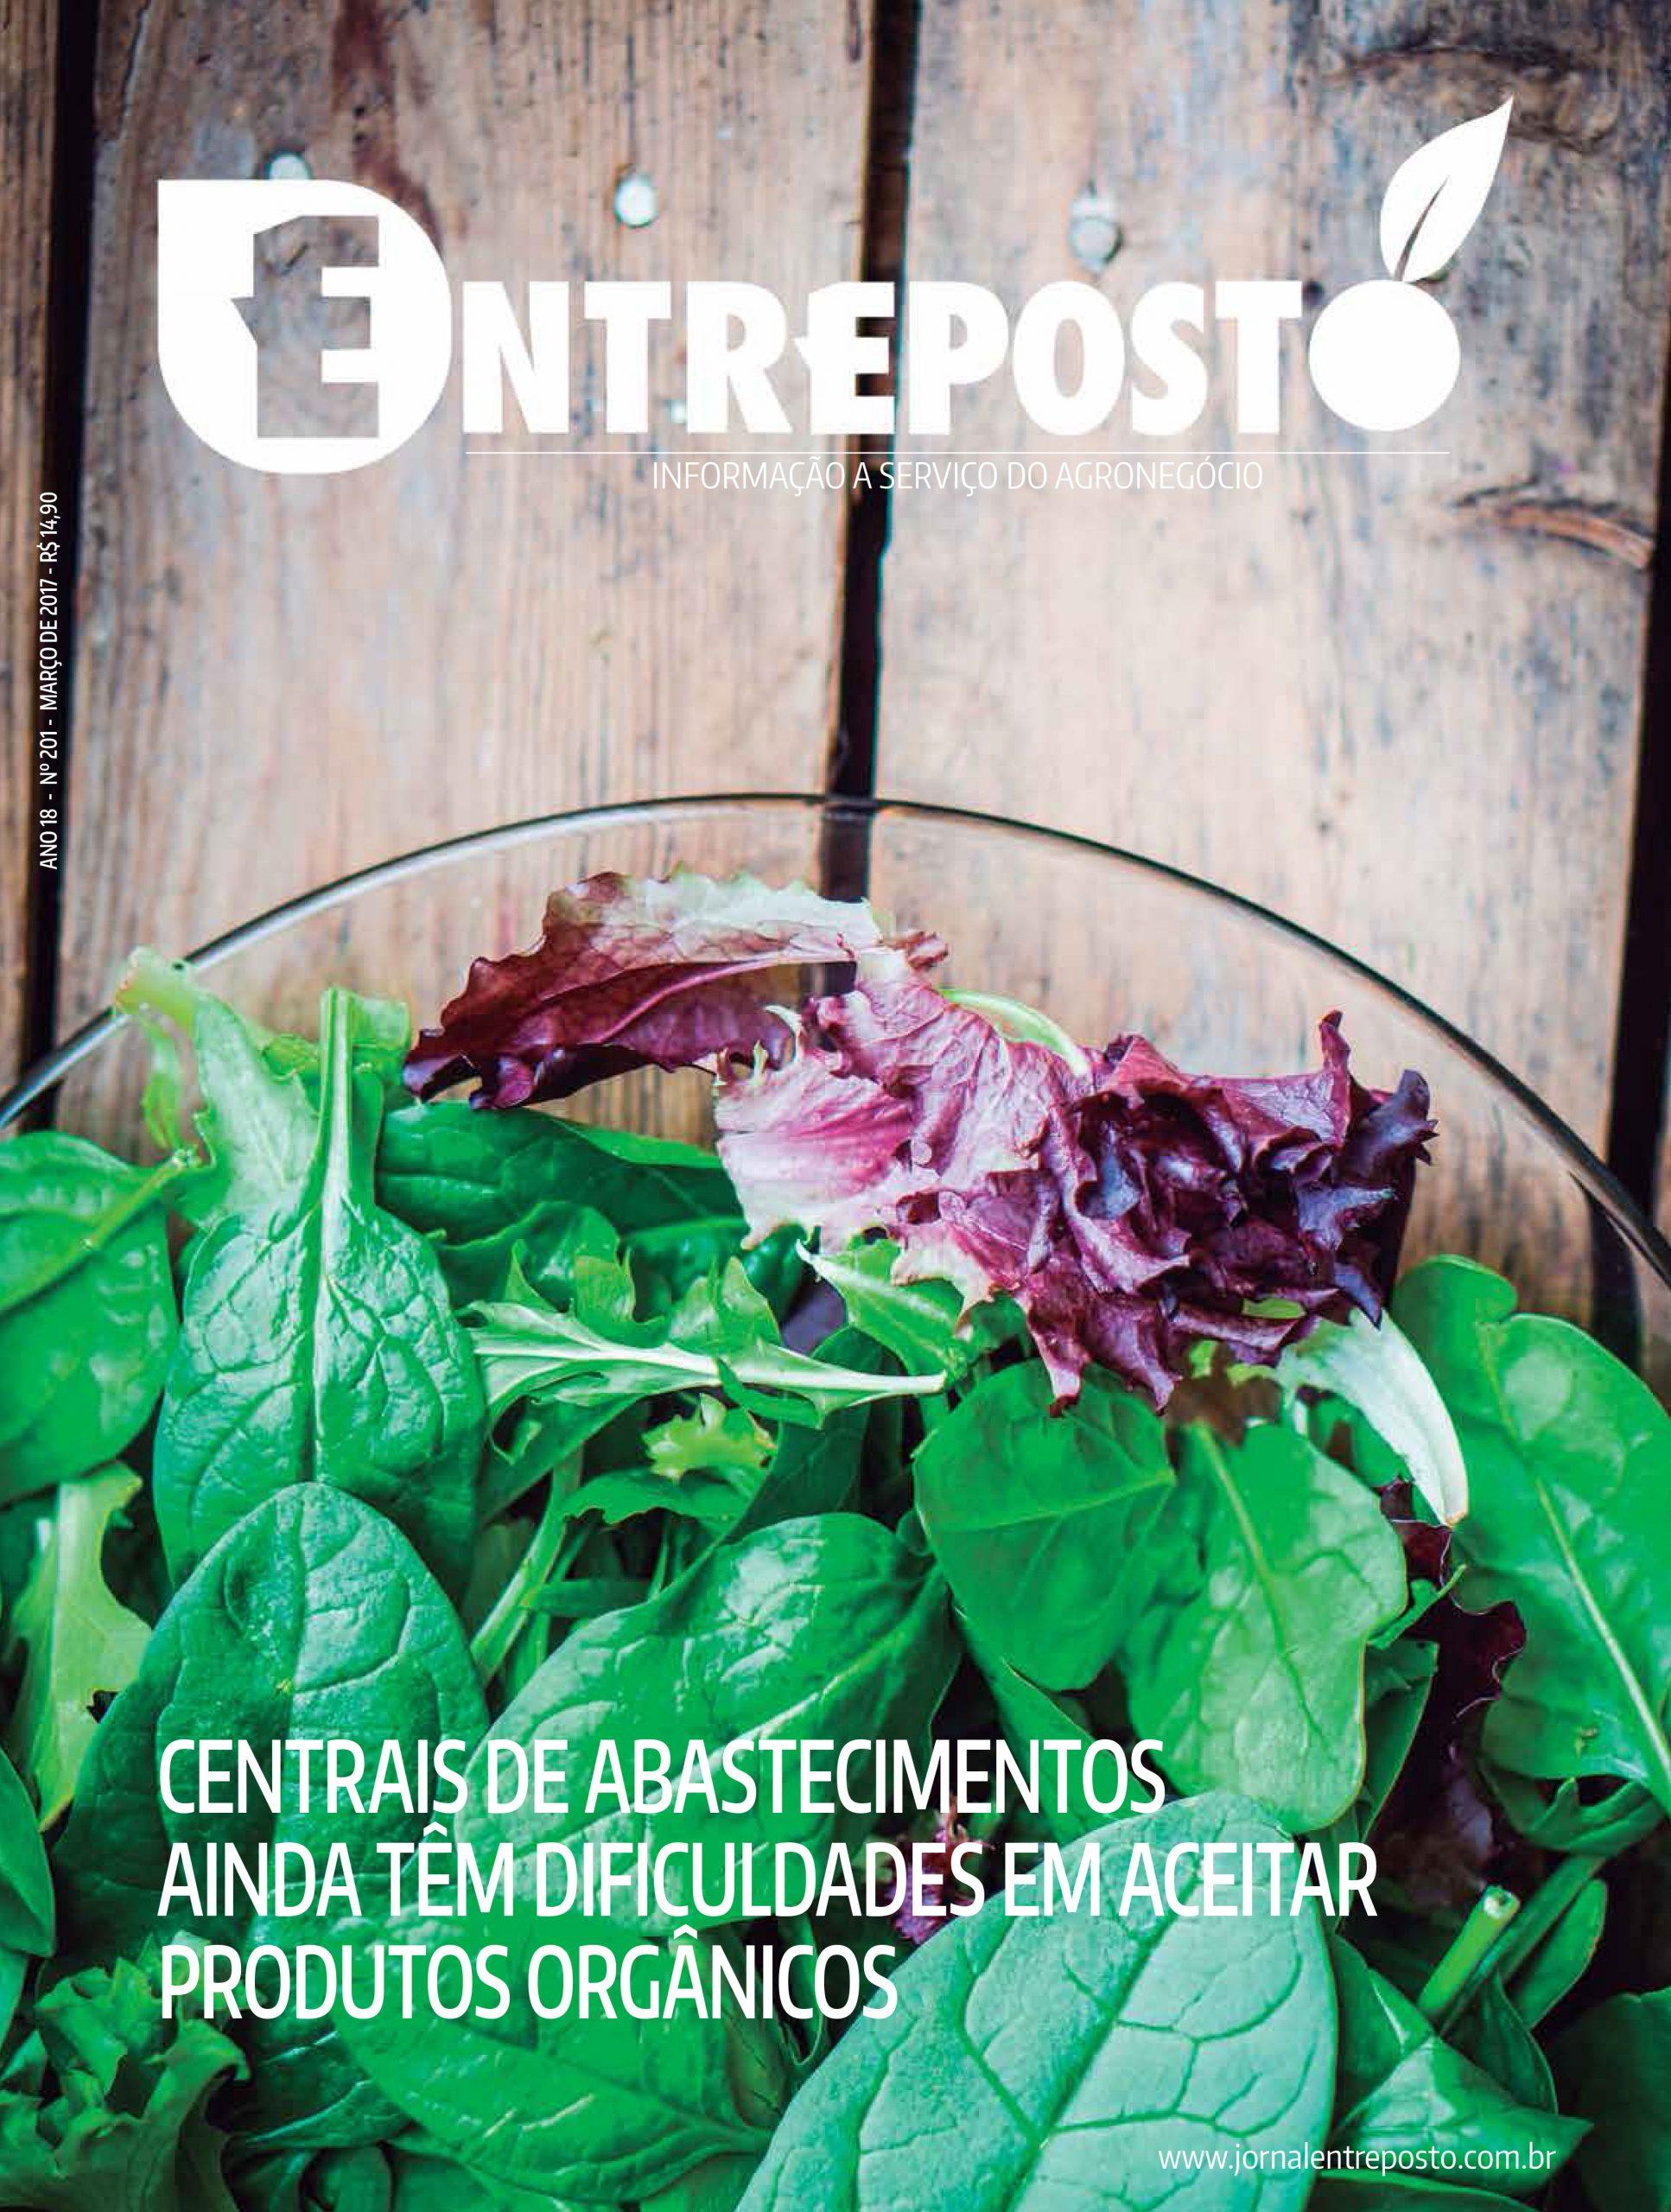 Jornal Entreposto